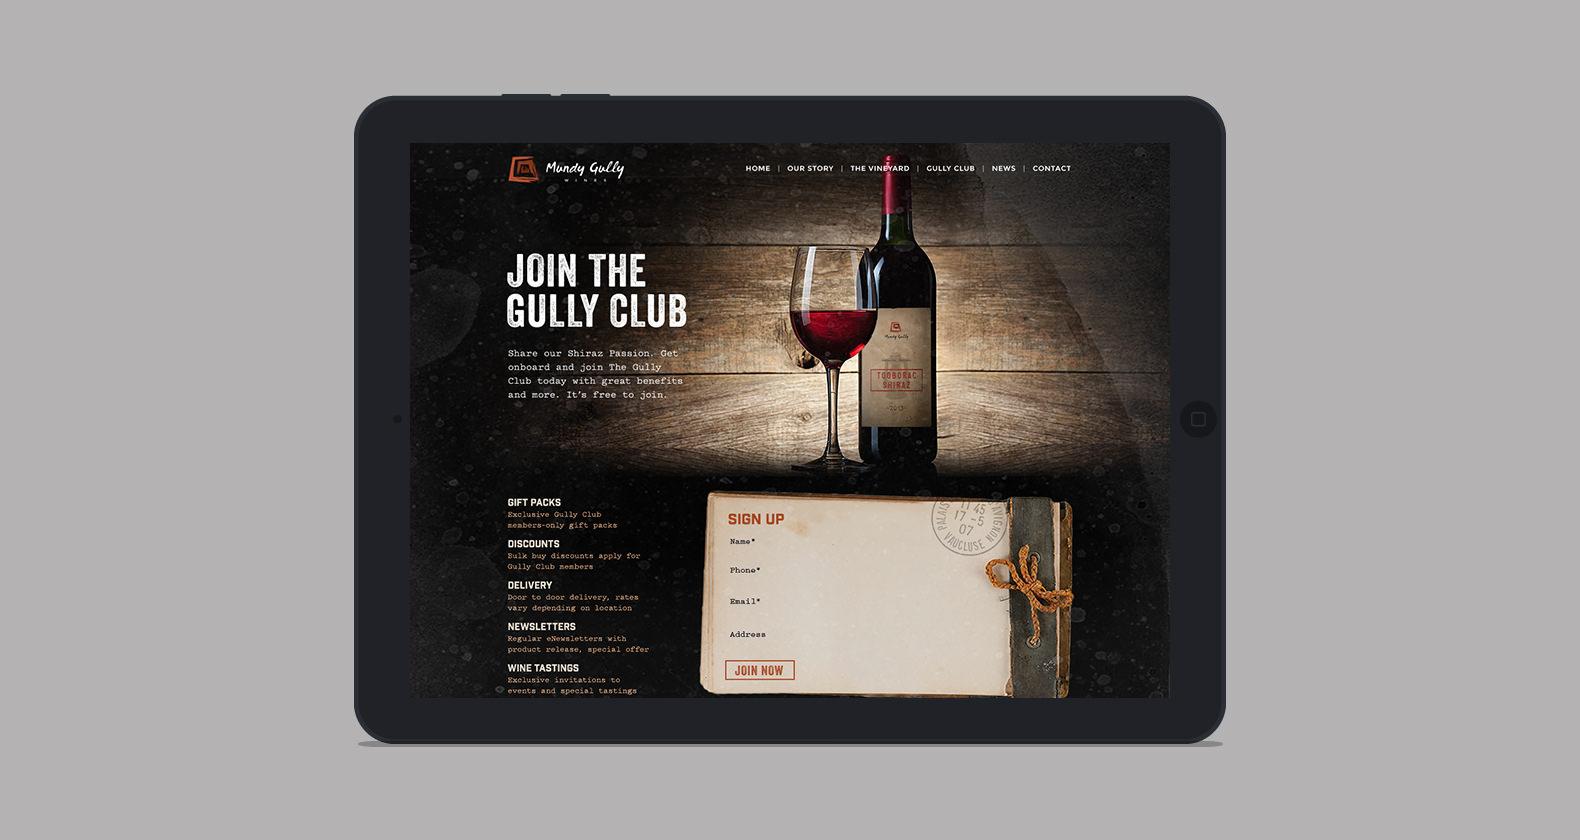 Mundy Gully - Web design, web development